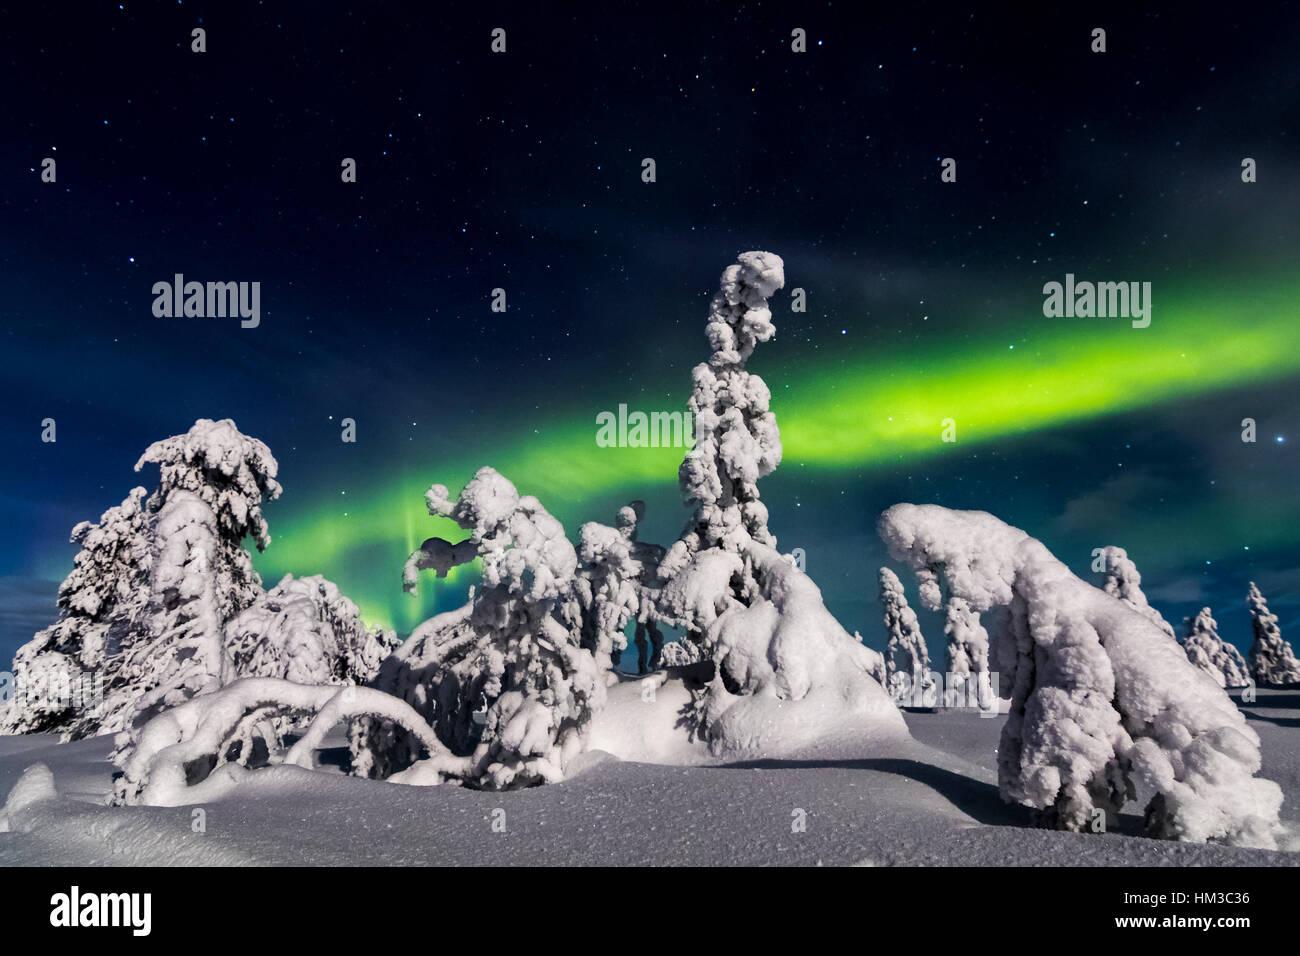 Northern lights in Riisitunturi national park, Finland - Stock Image